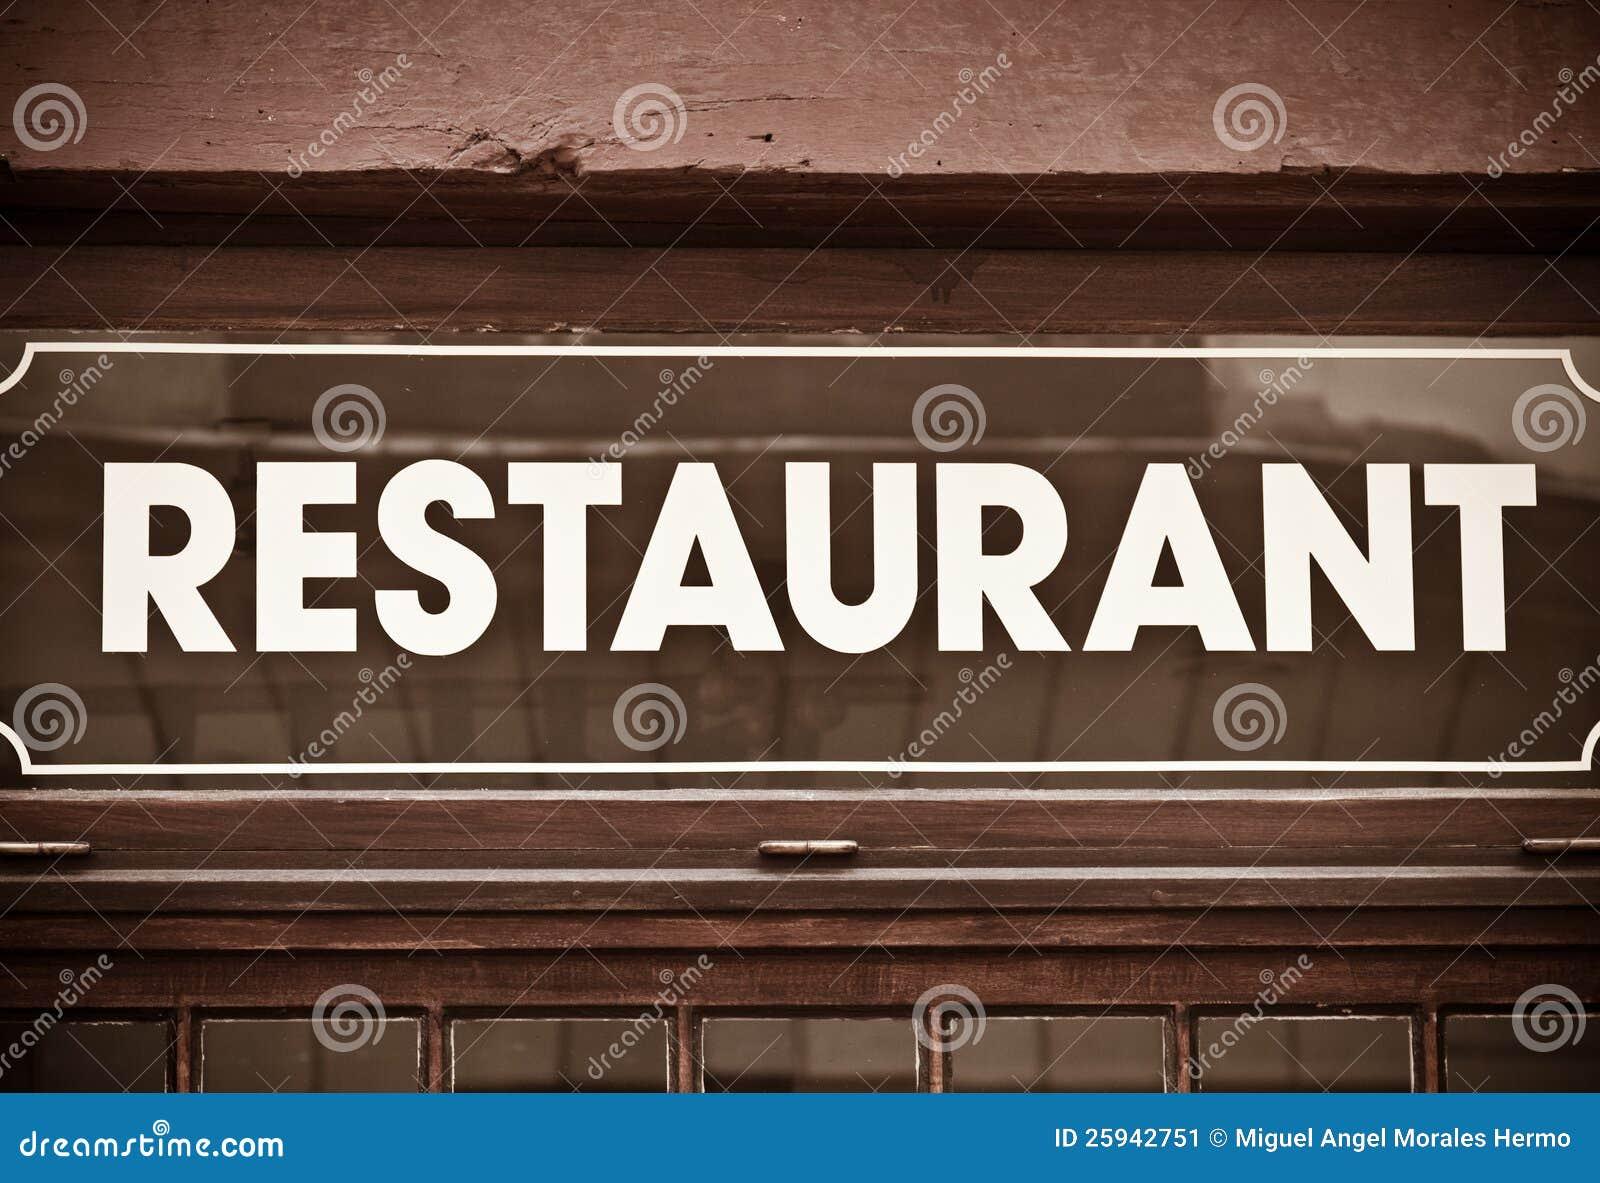 Restaurant Stock Image - Image: 25942751